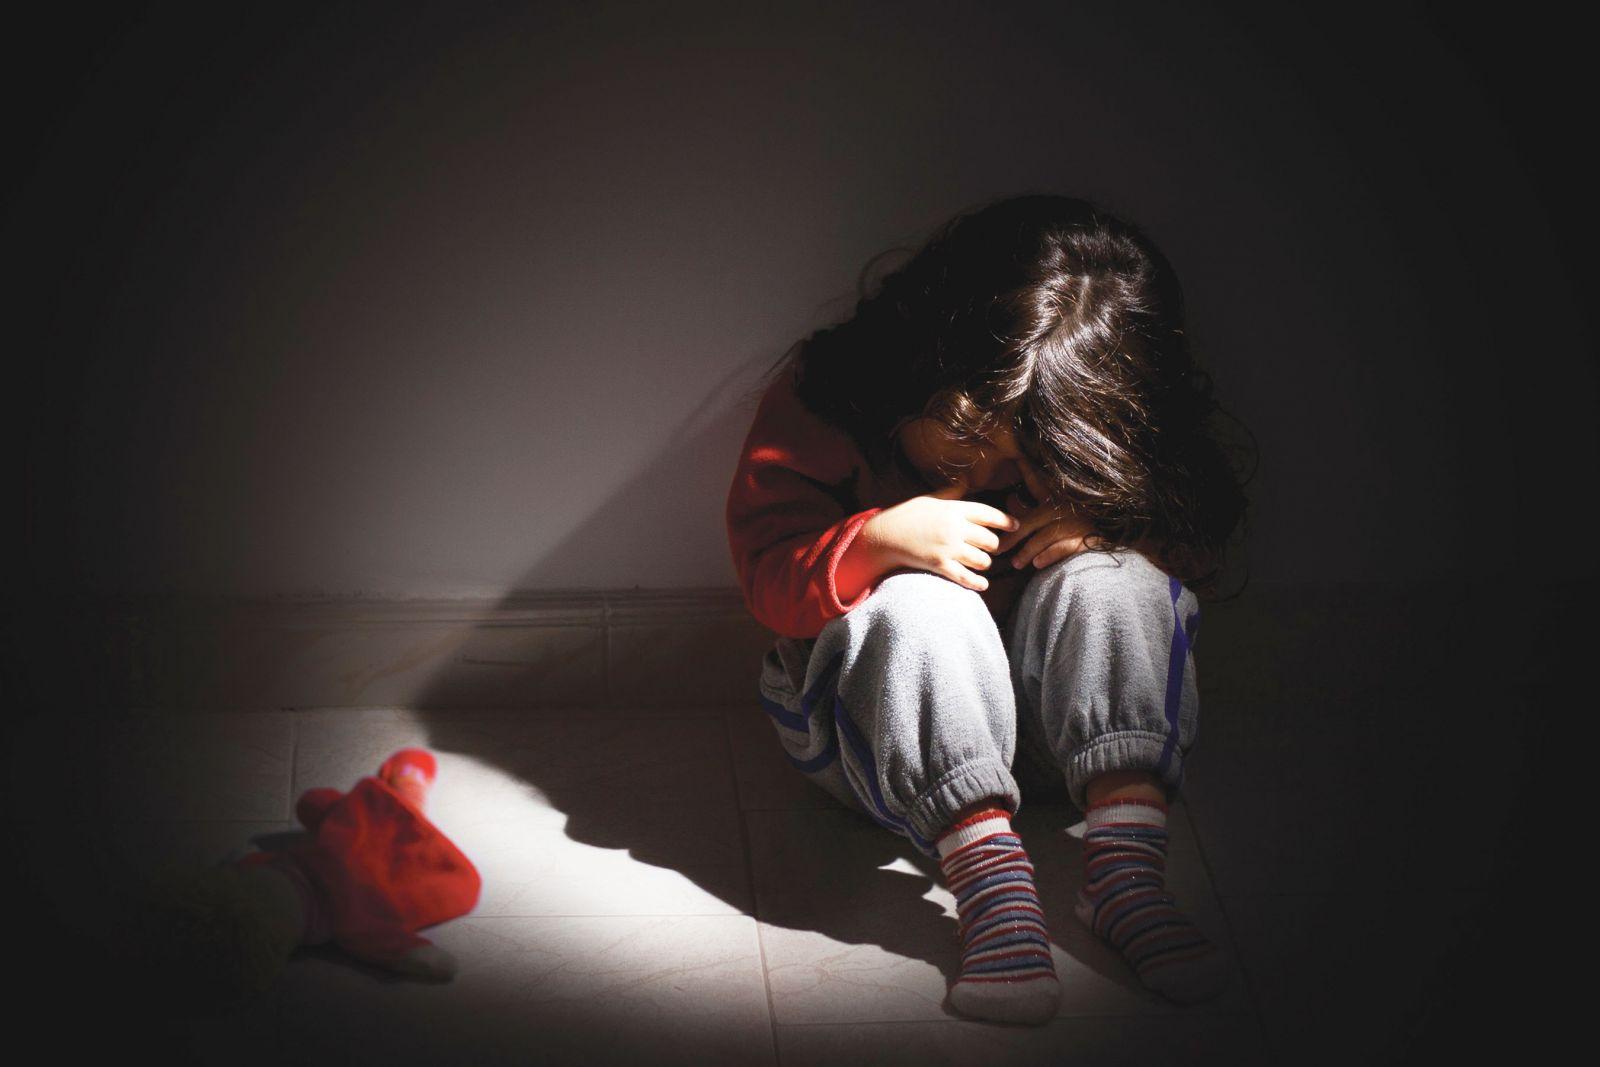 Childhood Psychological Traumas